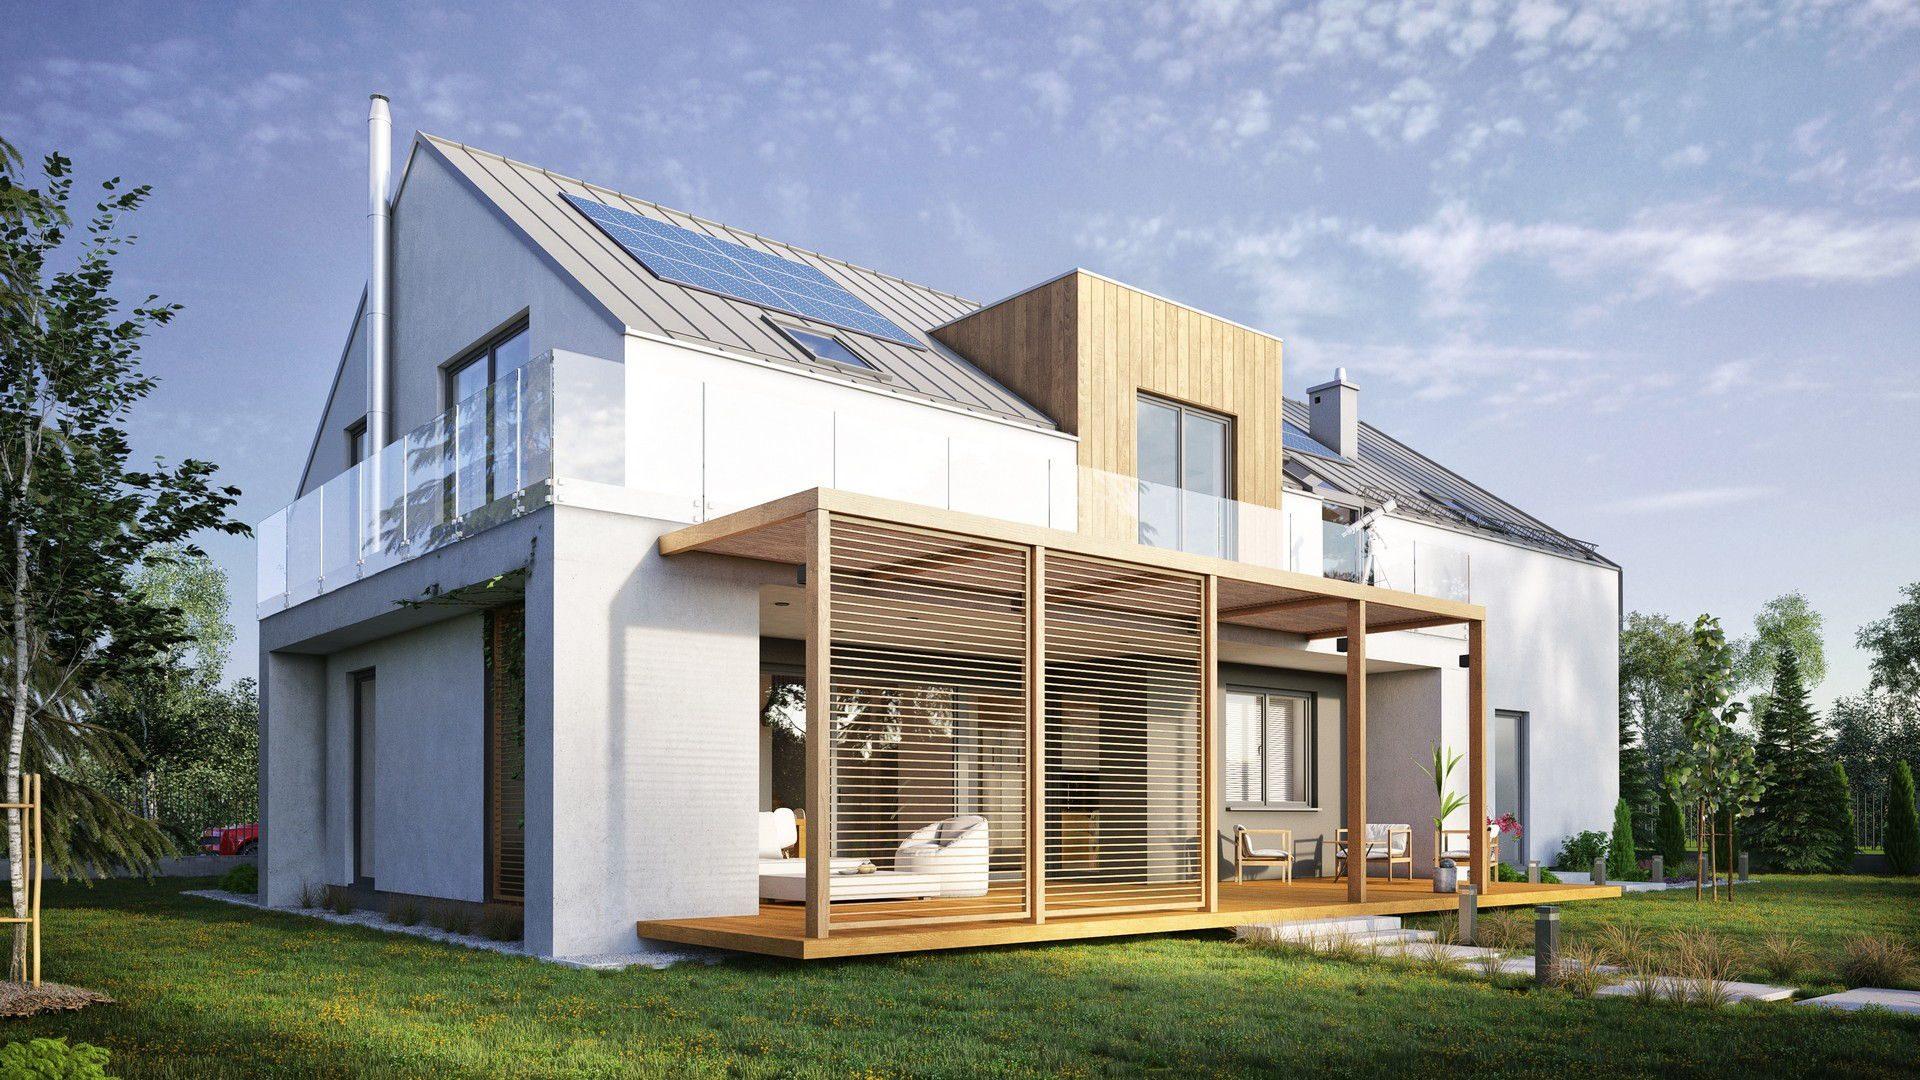 projekt domu z lukarną śląsk